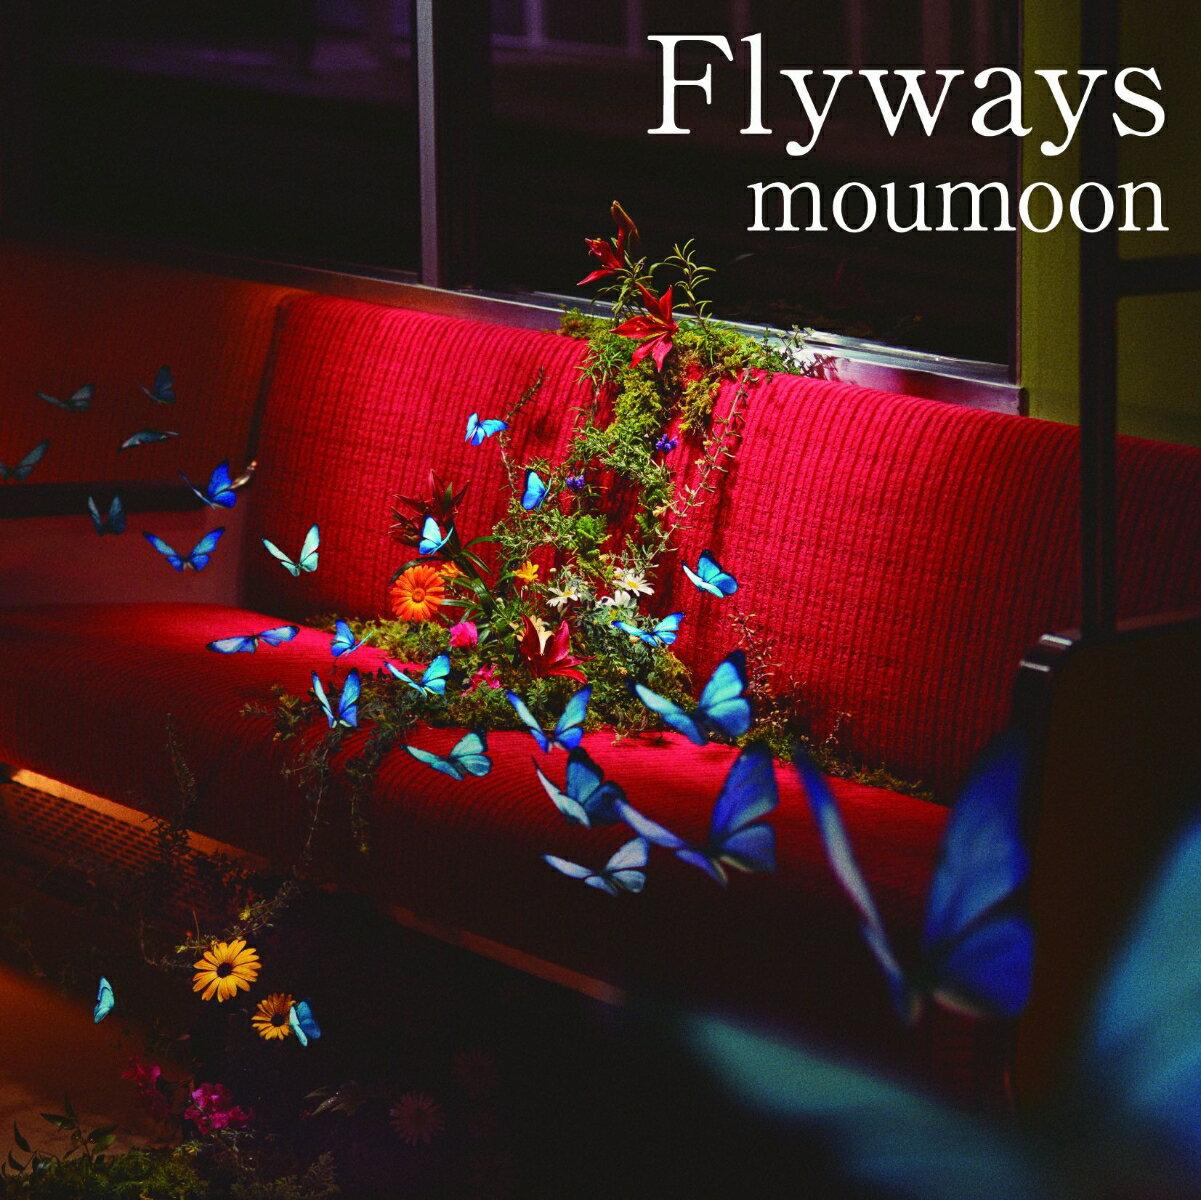 Flyways [ moumoon ]